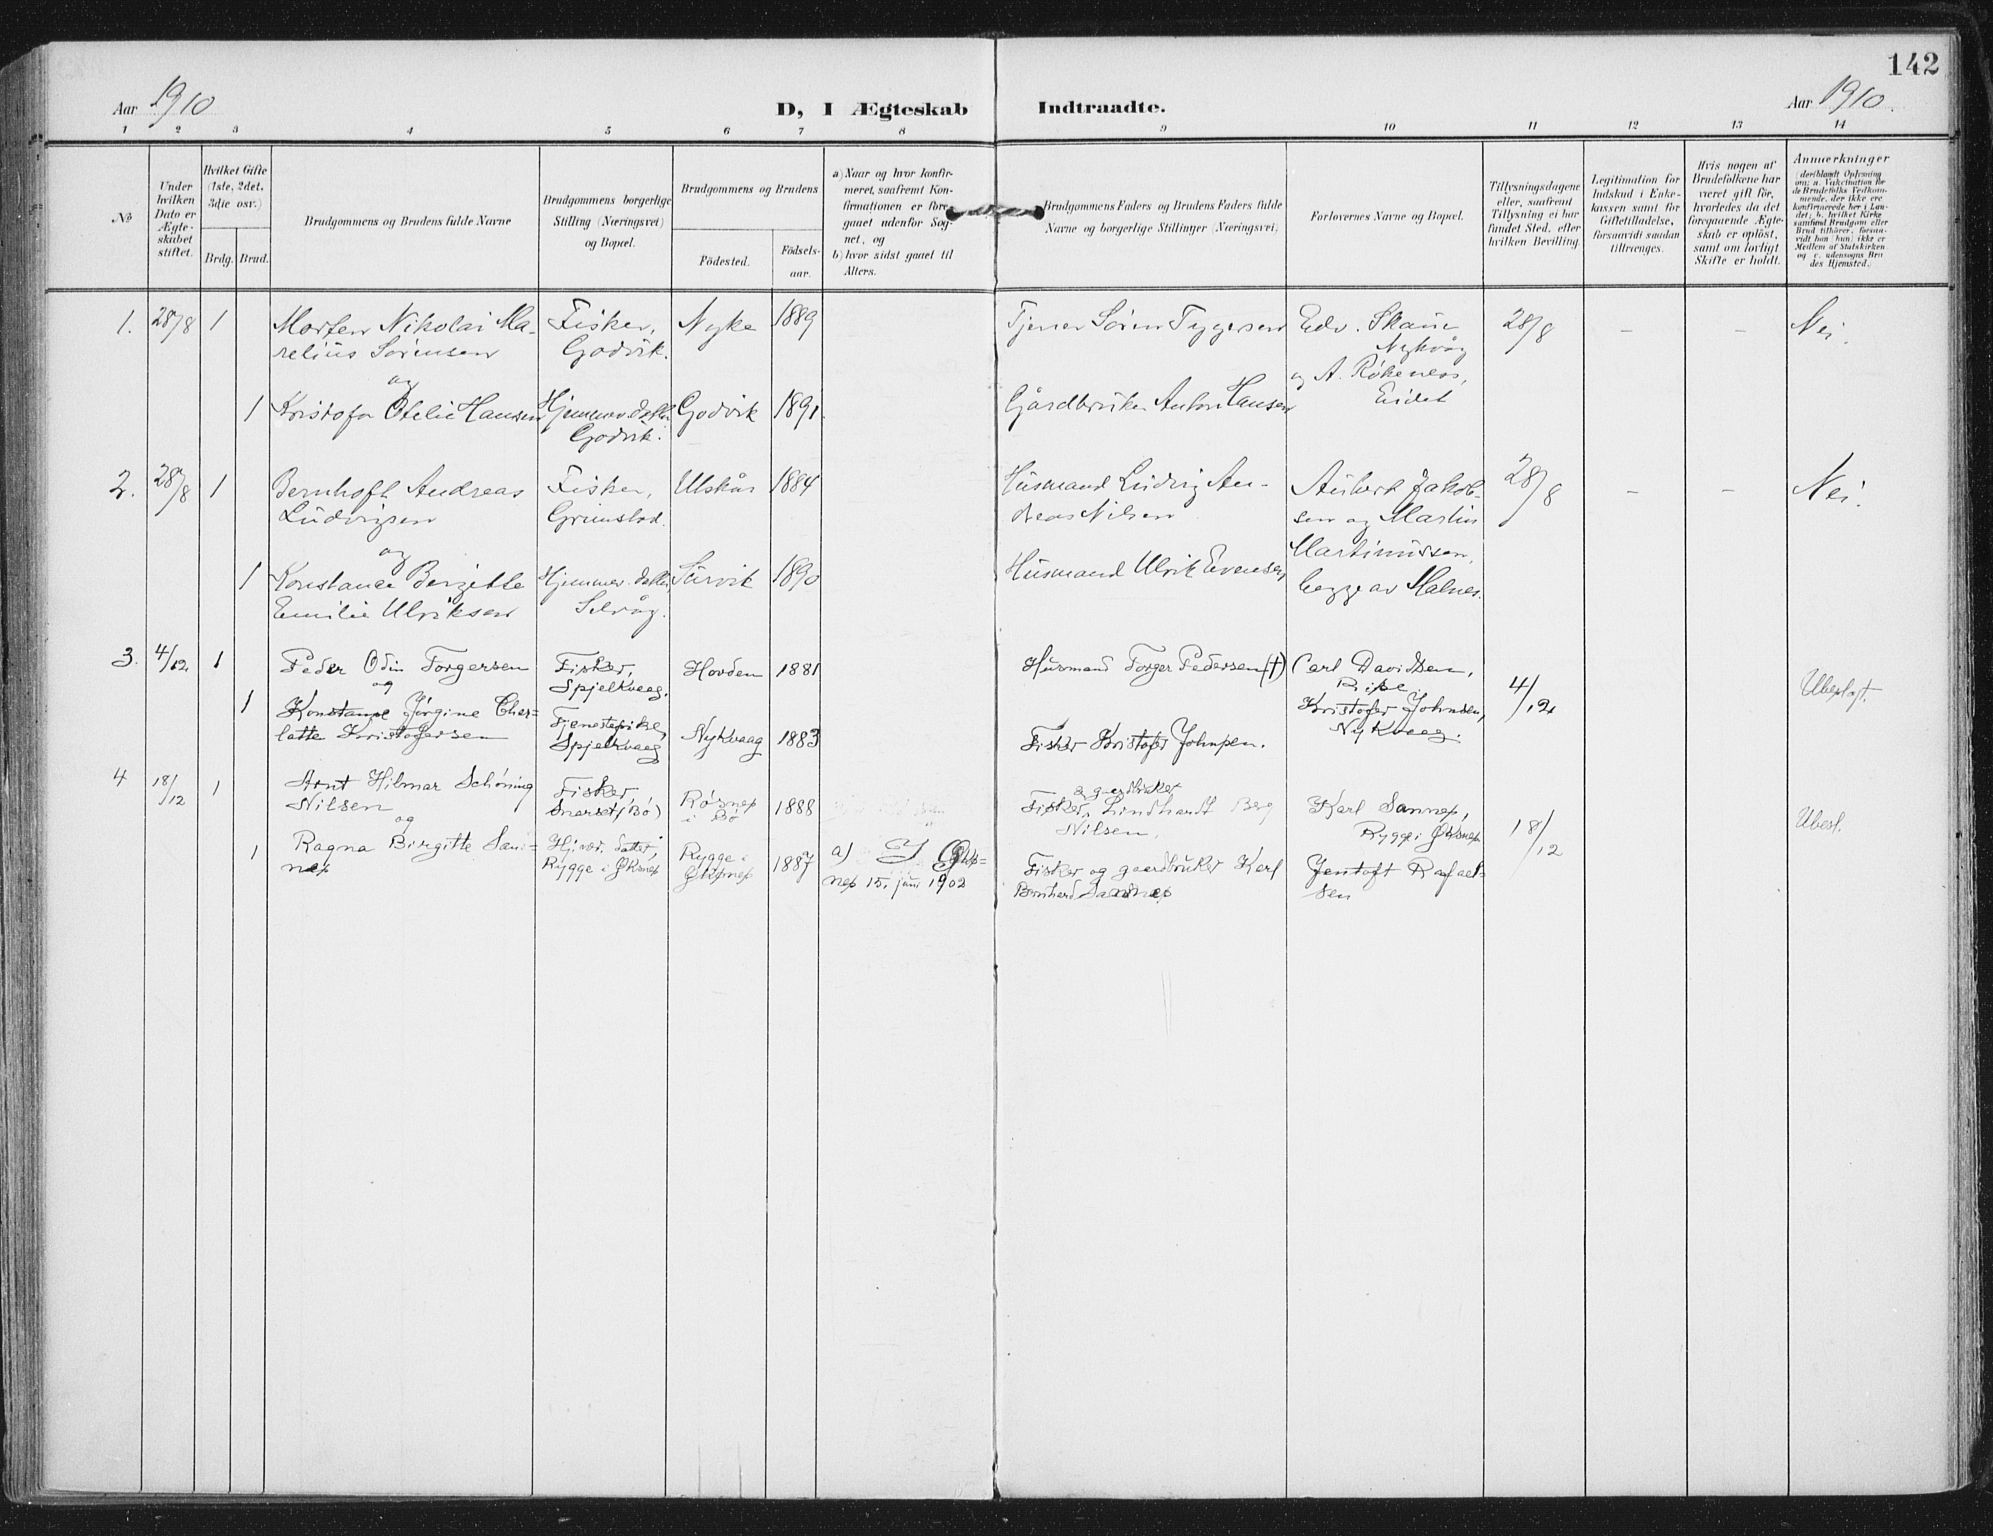 SAT, Ministerialprotokoller, klokkerbøker og fødselsregistre - Nordland, 892/L1321: Ministerialbok nr. 892A02, 1902-1918, s. 142